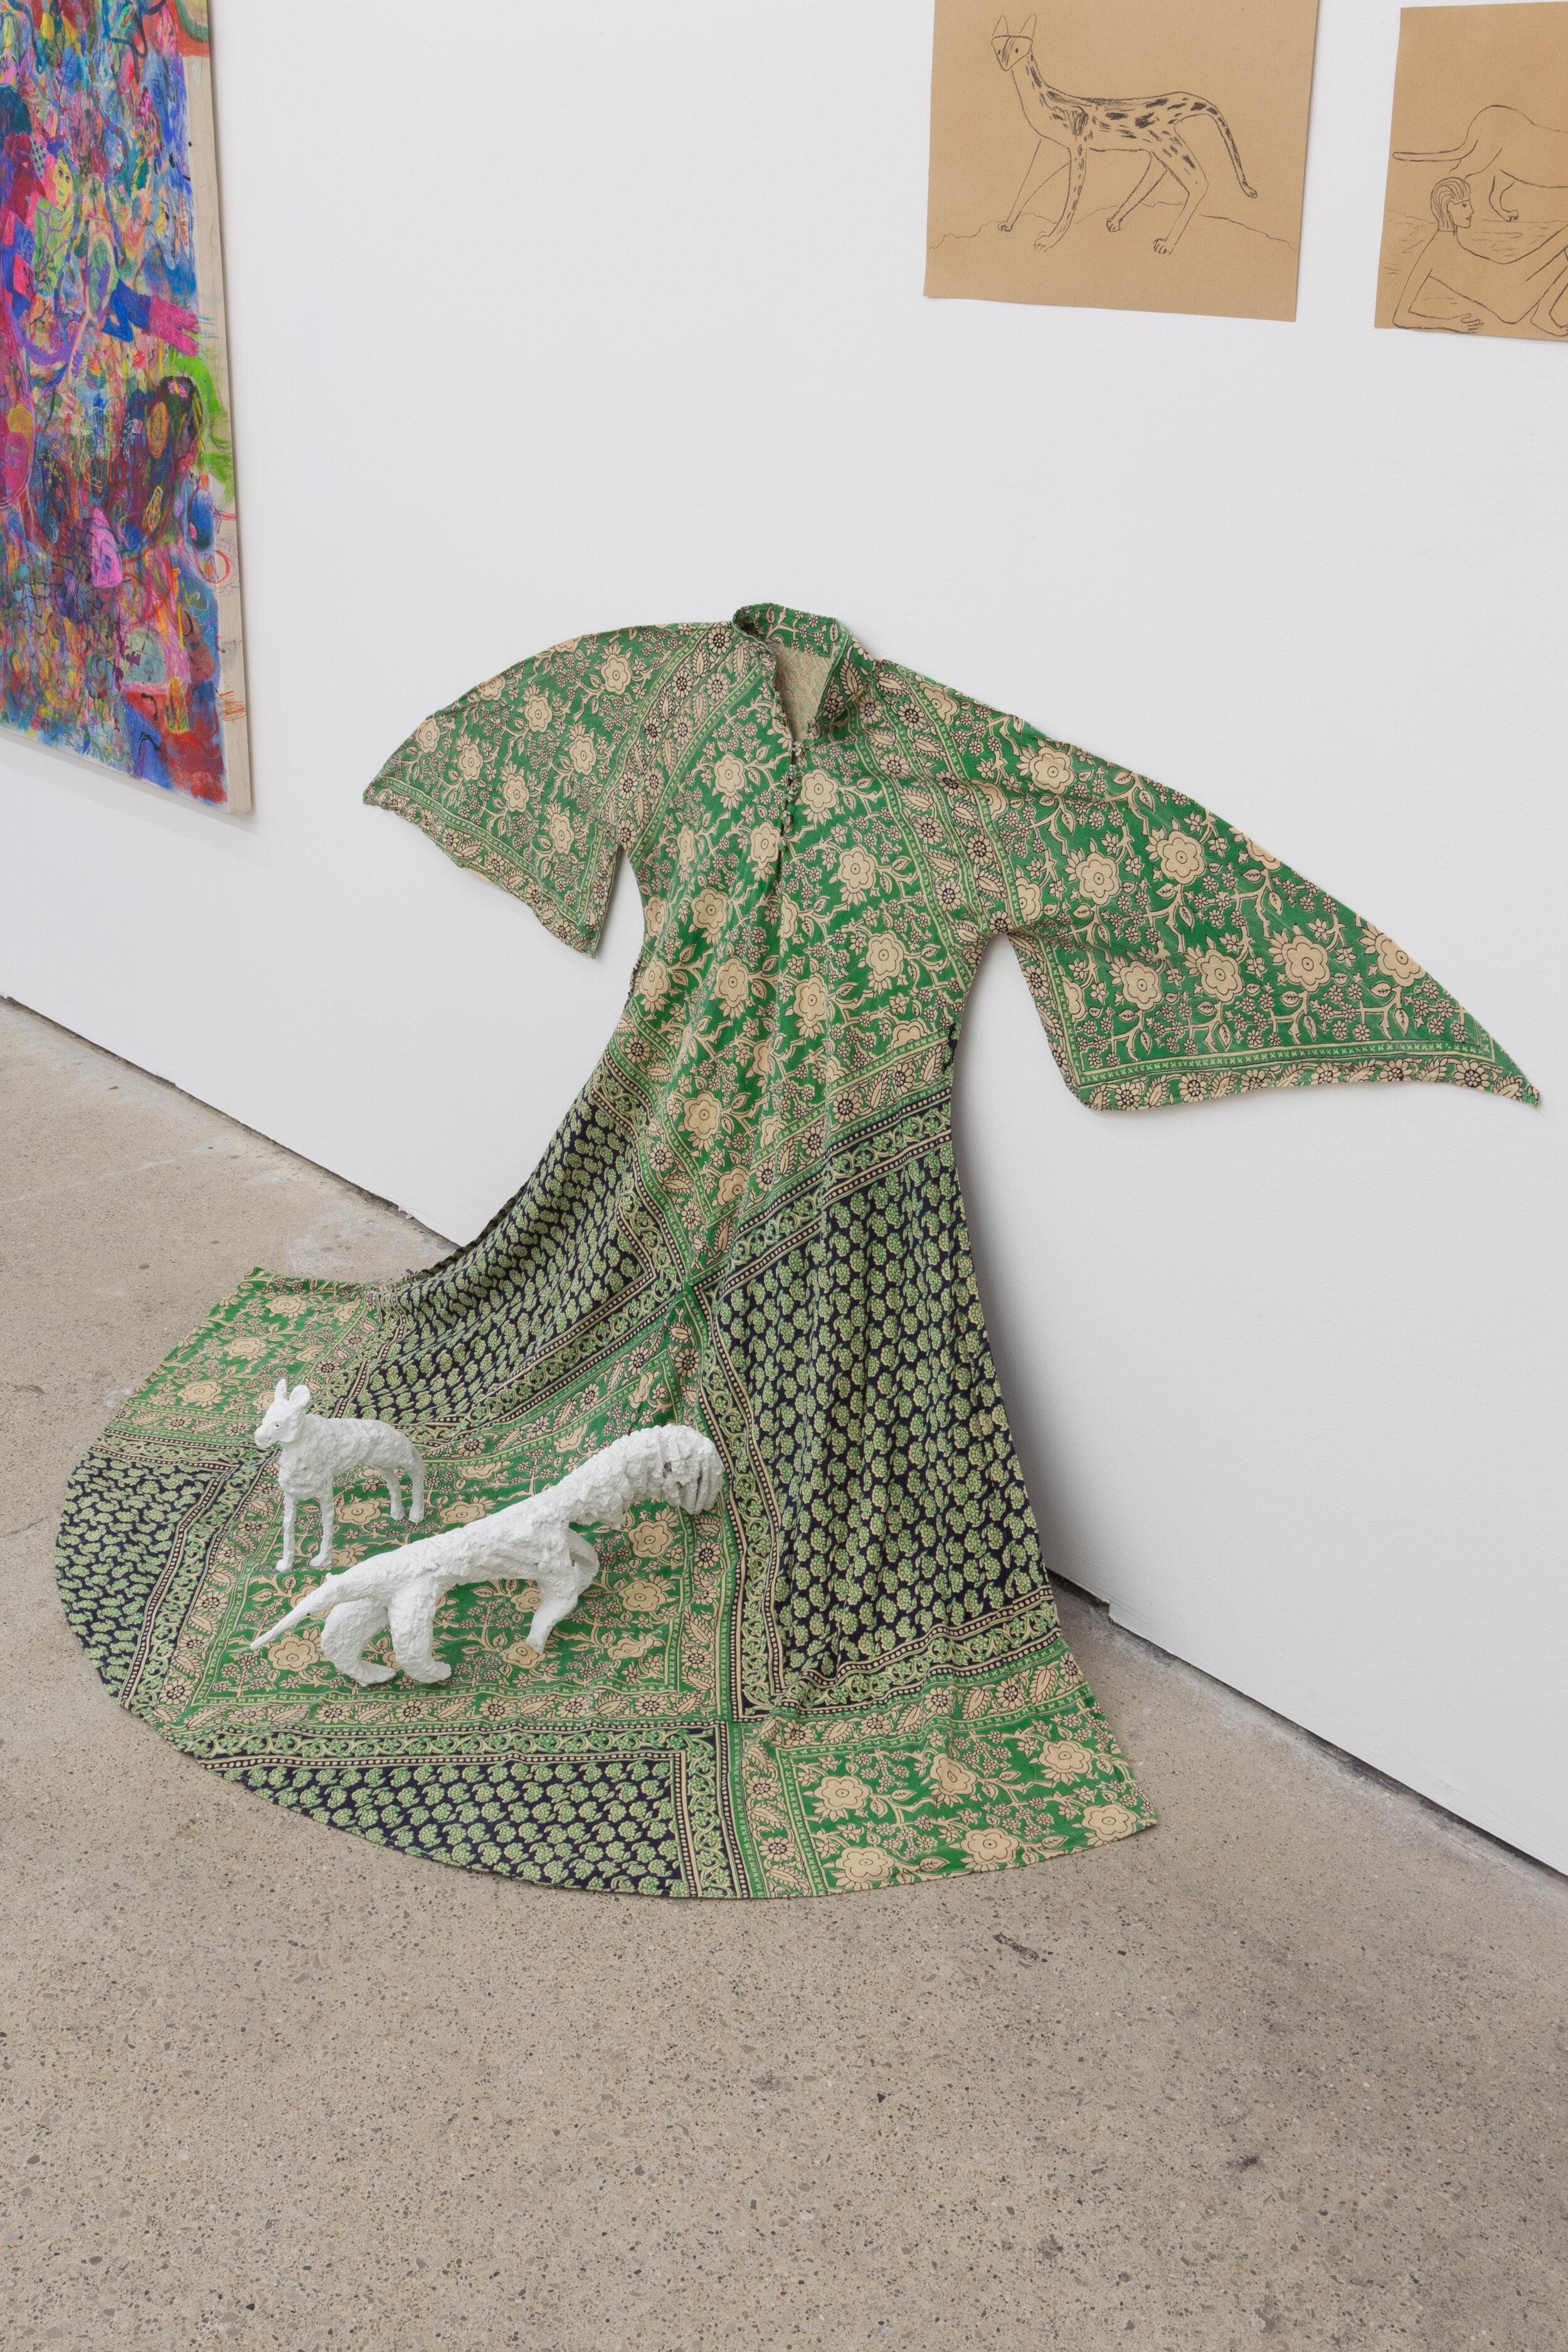 Lin May Saeed  Hyena , 2019;  Anteater , 2019 (installation view)